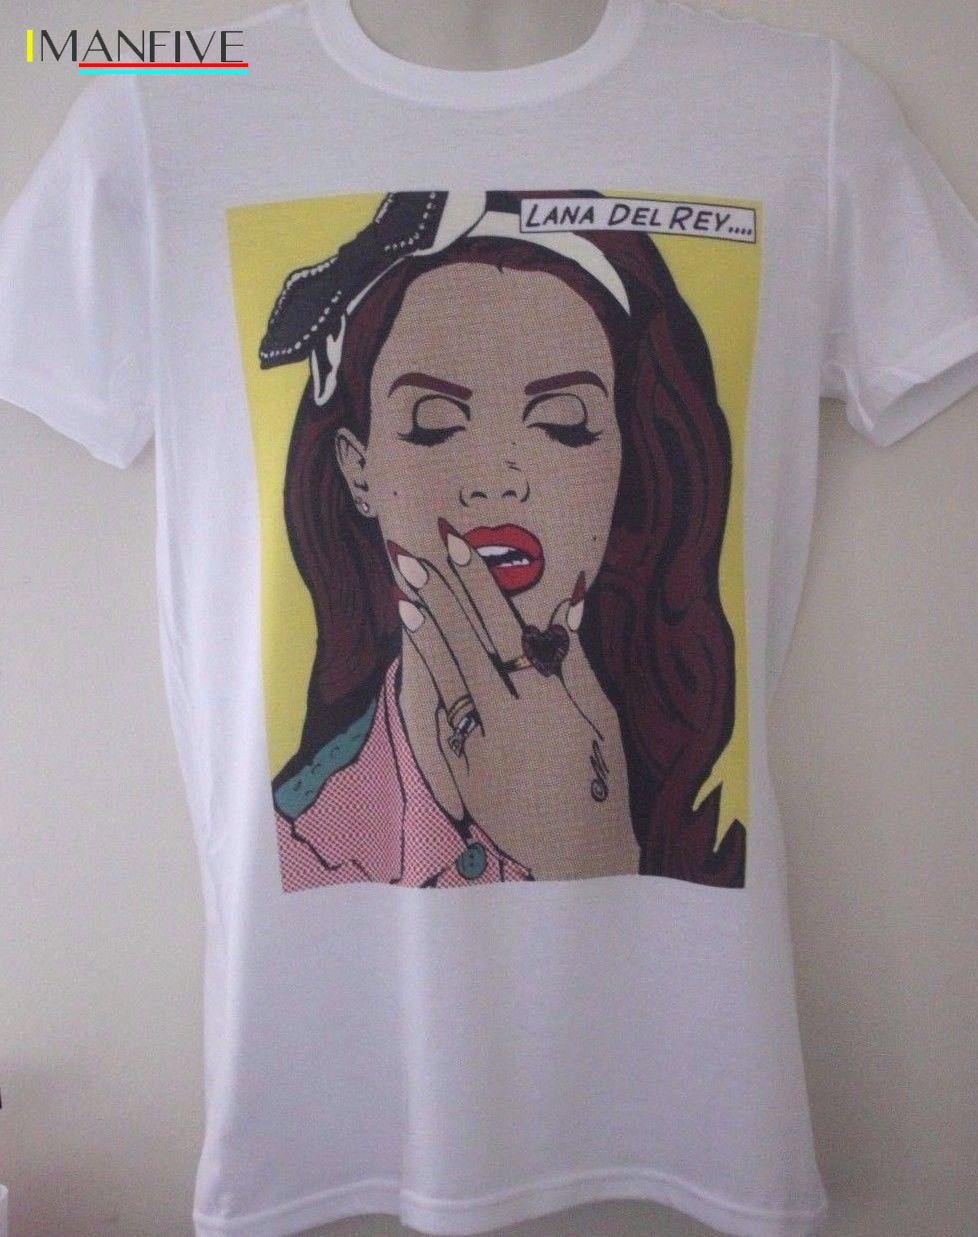 Lana heartshapeglasses t-shirt Black Gaga del rey Katy perry taylor swift